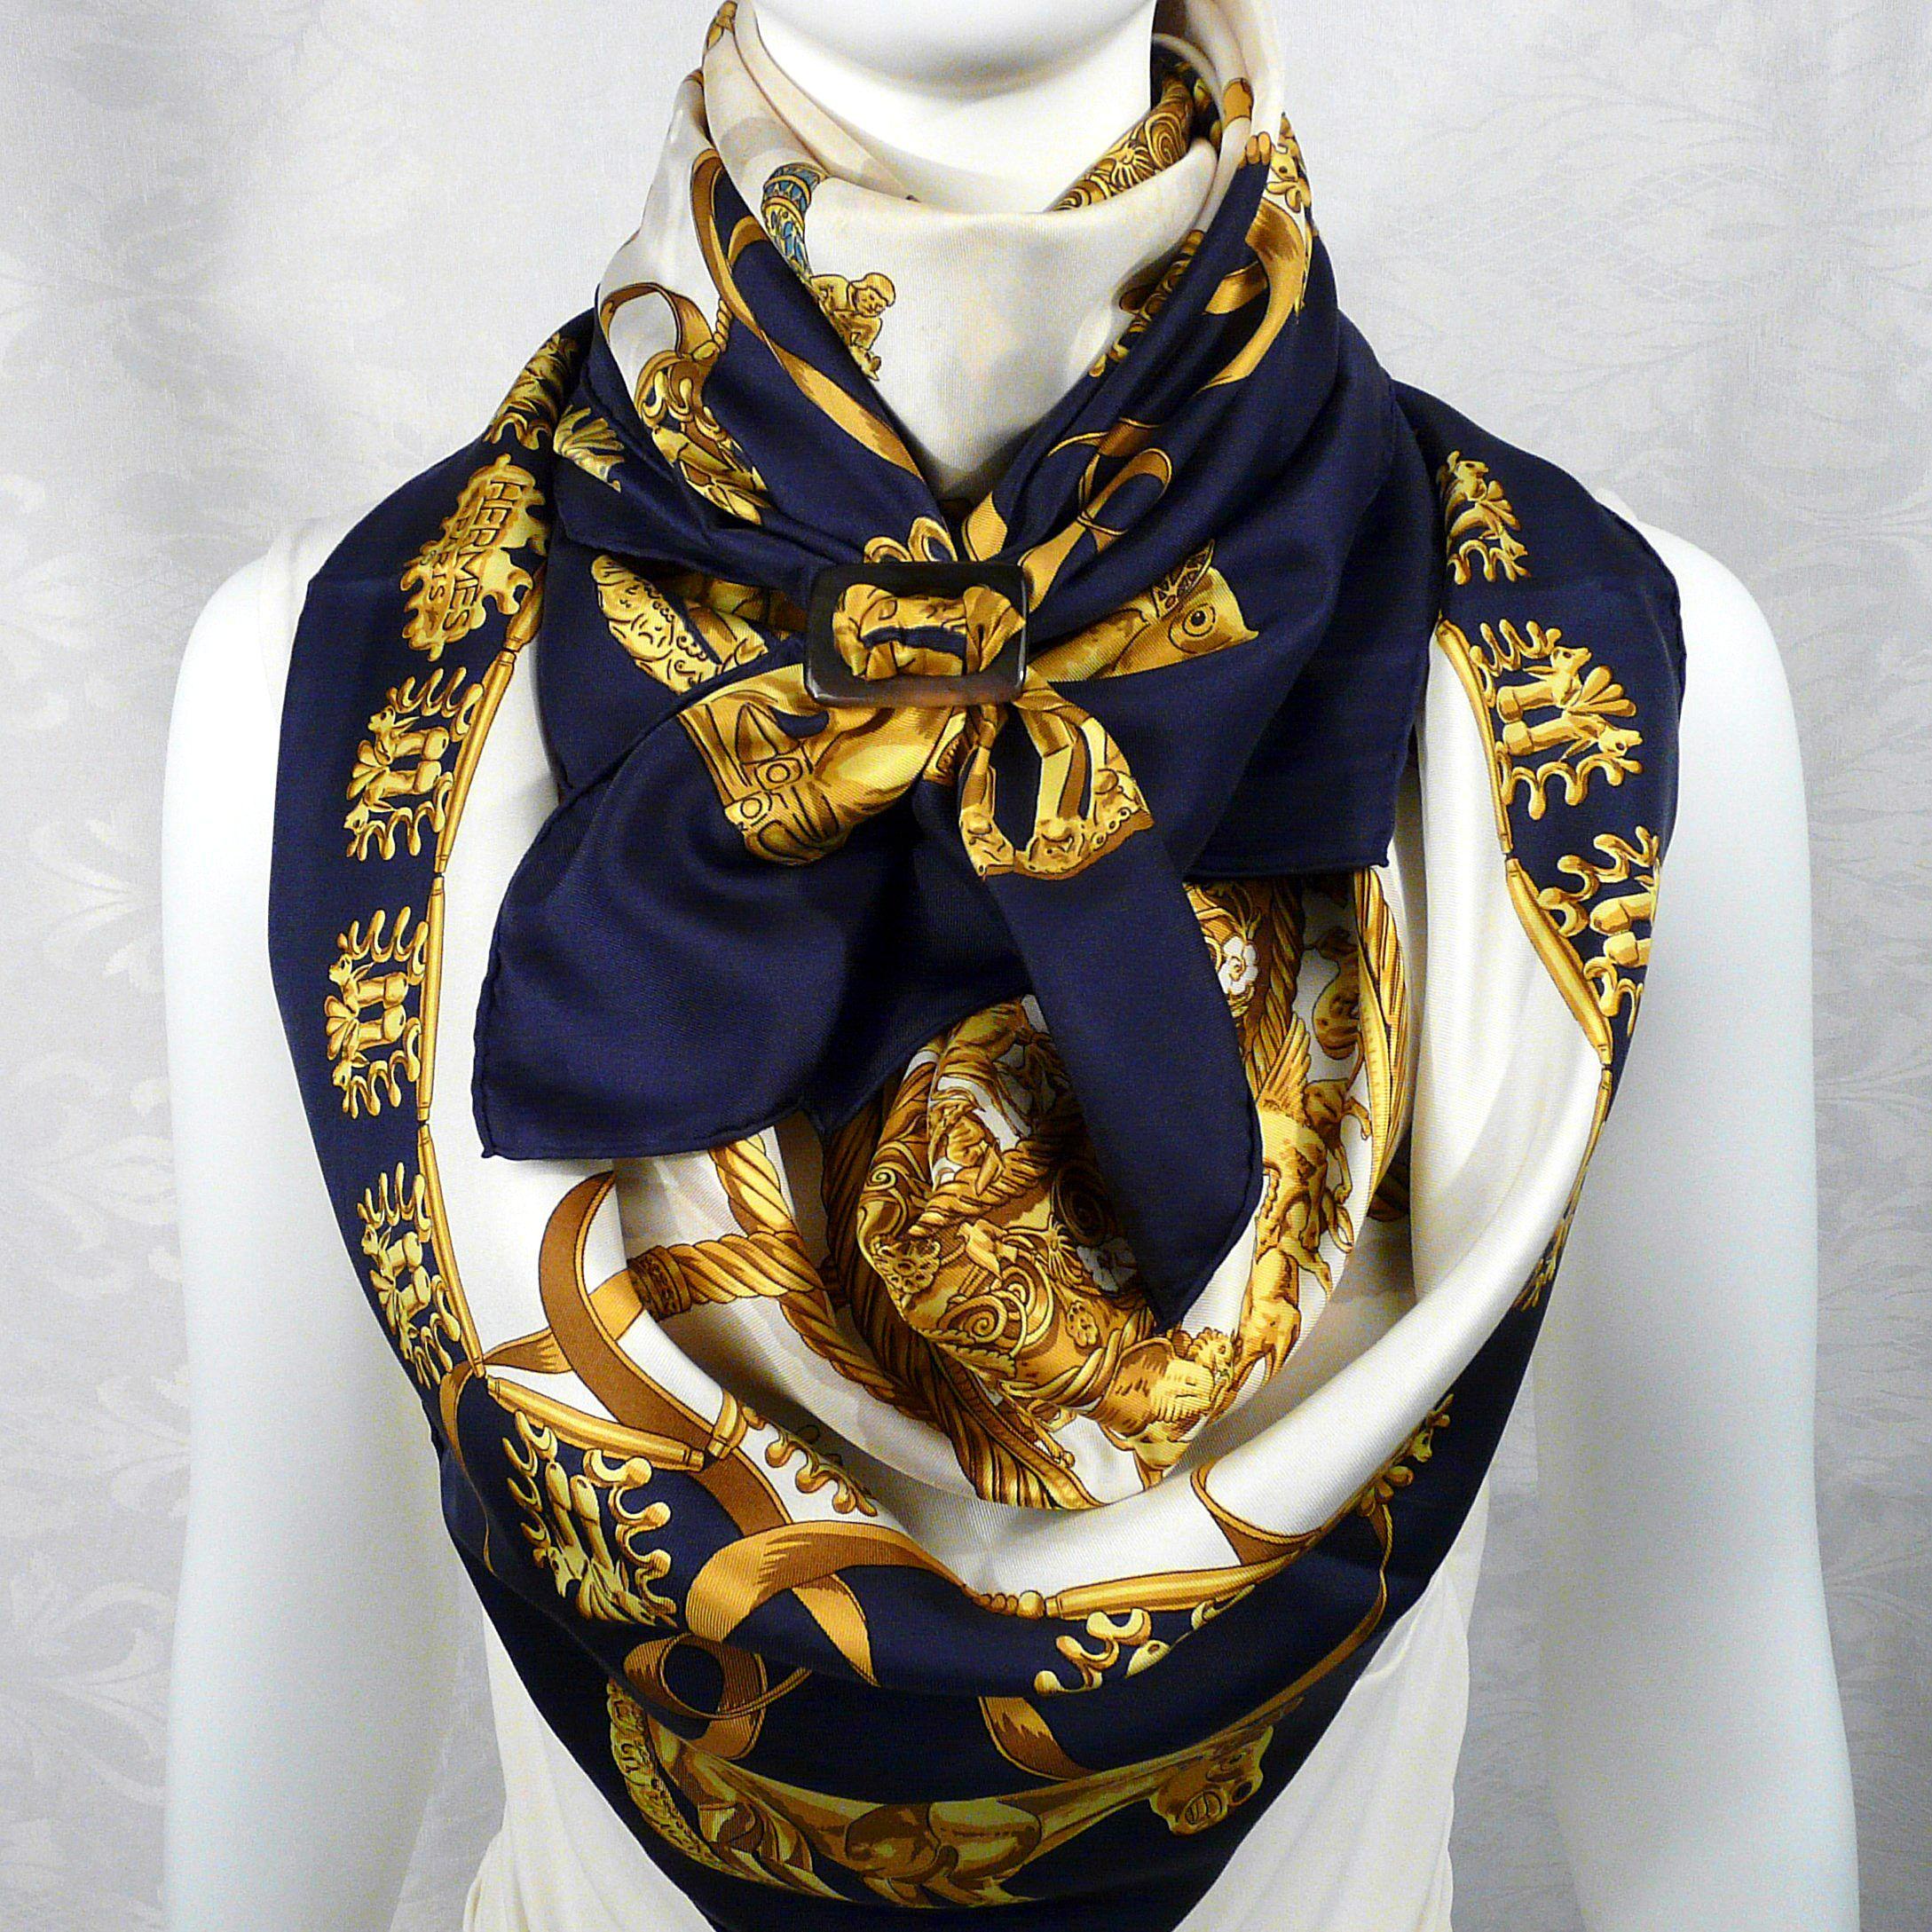 2 cavaliers d or hermes scarves with anneau ceinture horn